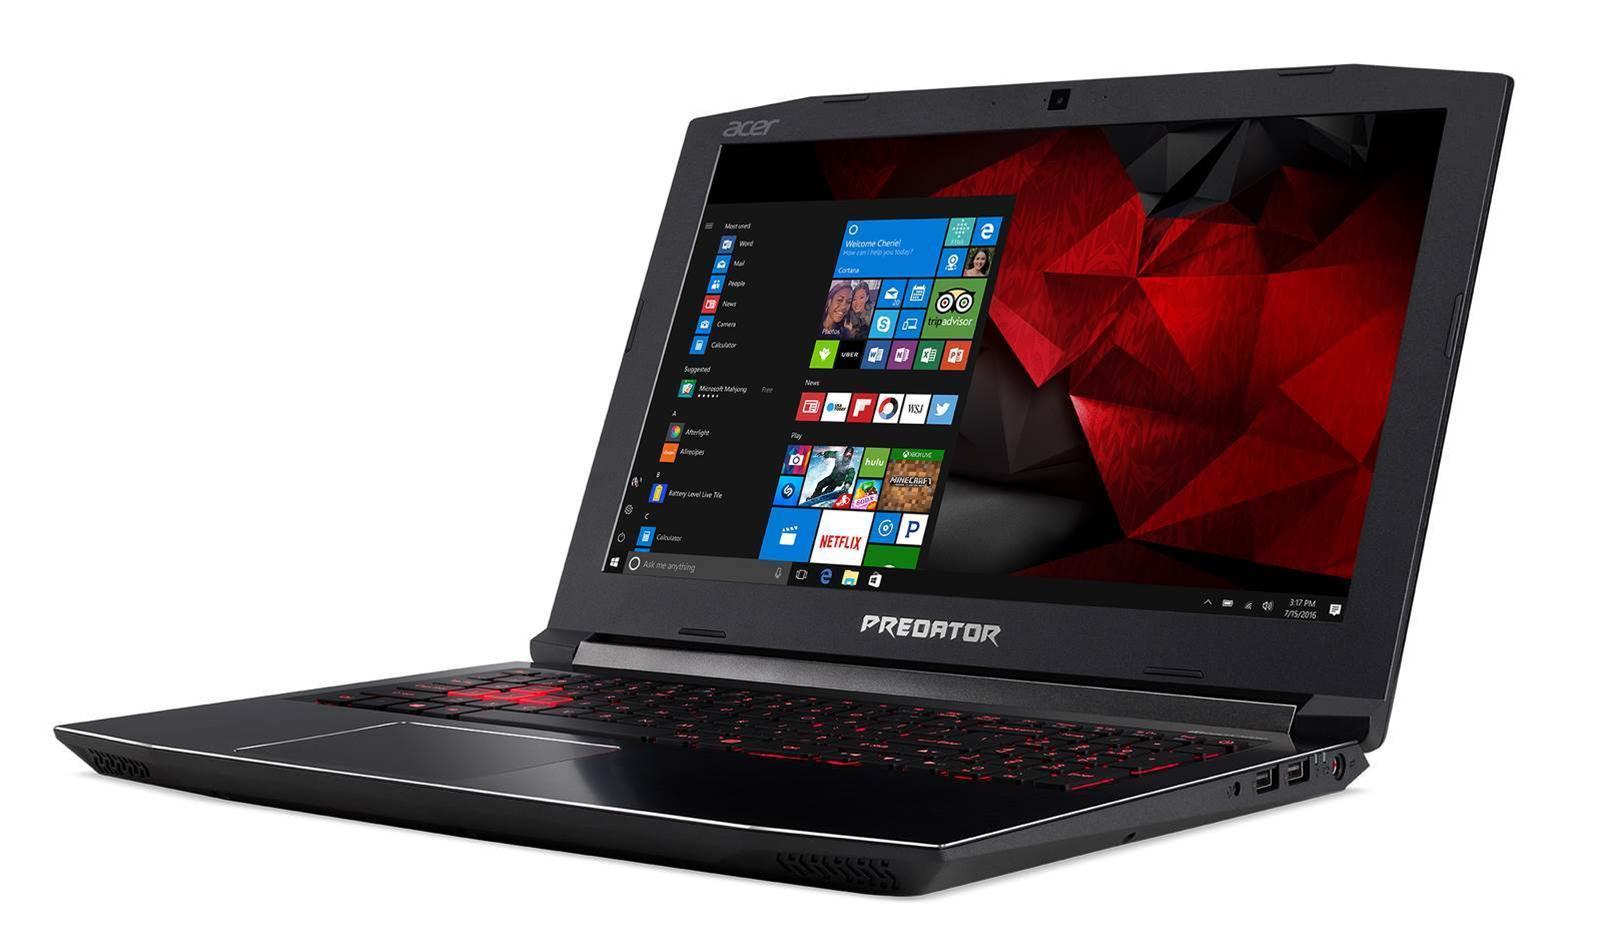 Acer's Predator Helios 300 laptop launches in Australia